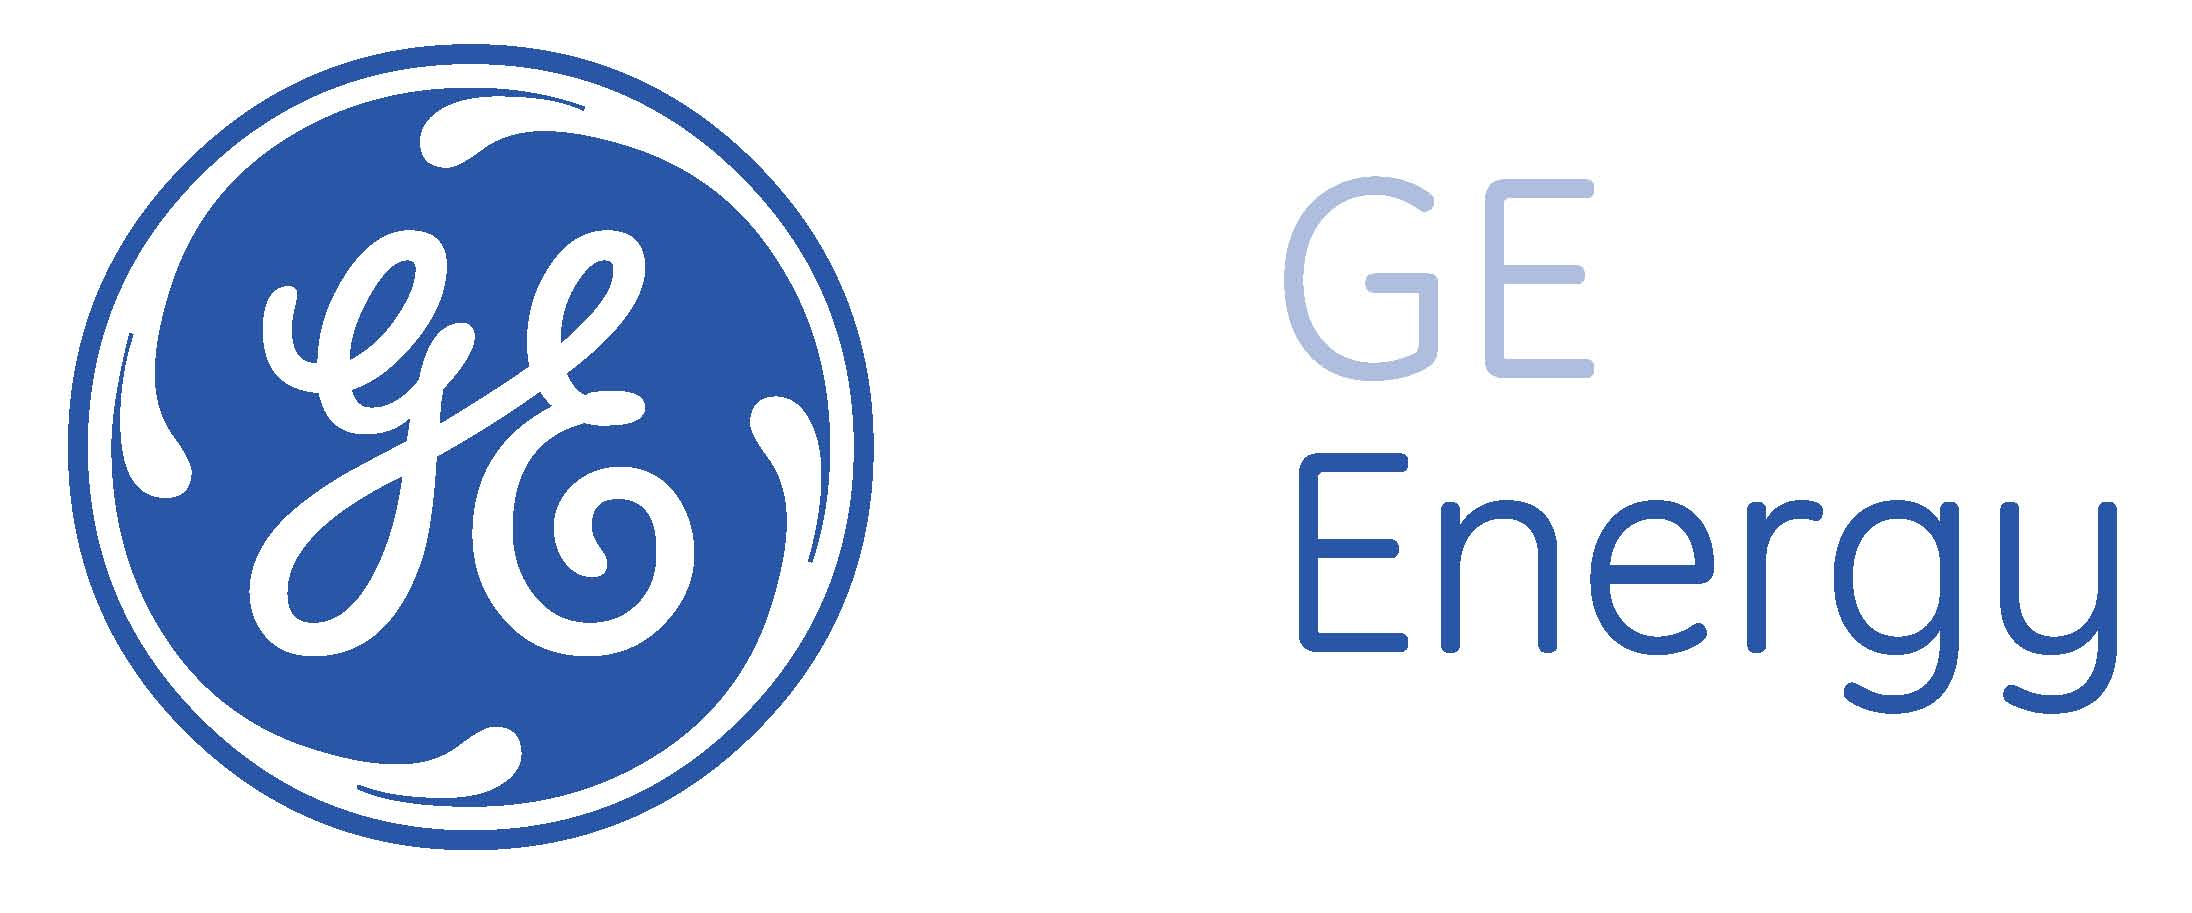 ge和微软同时表示,predix平台和azure云平台的强强联手,将把通用电气